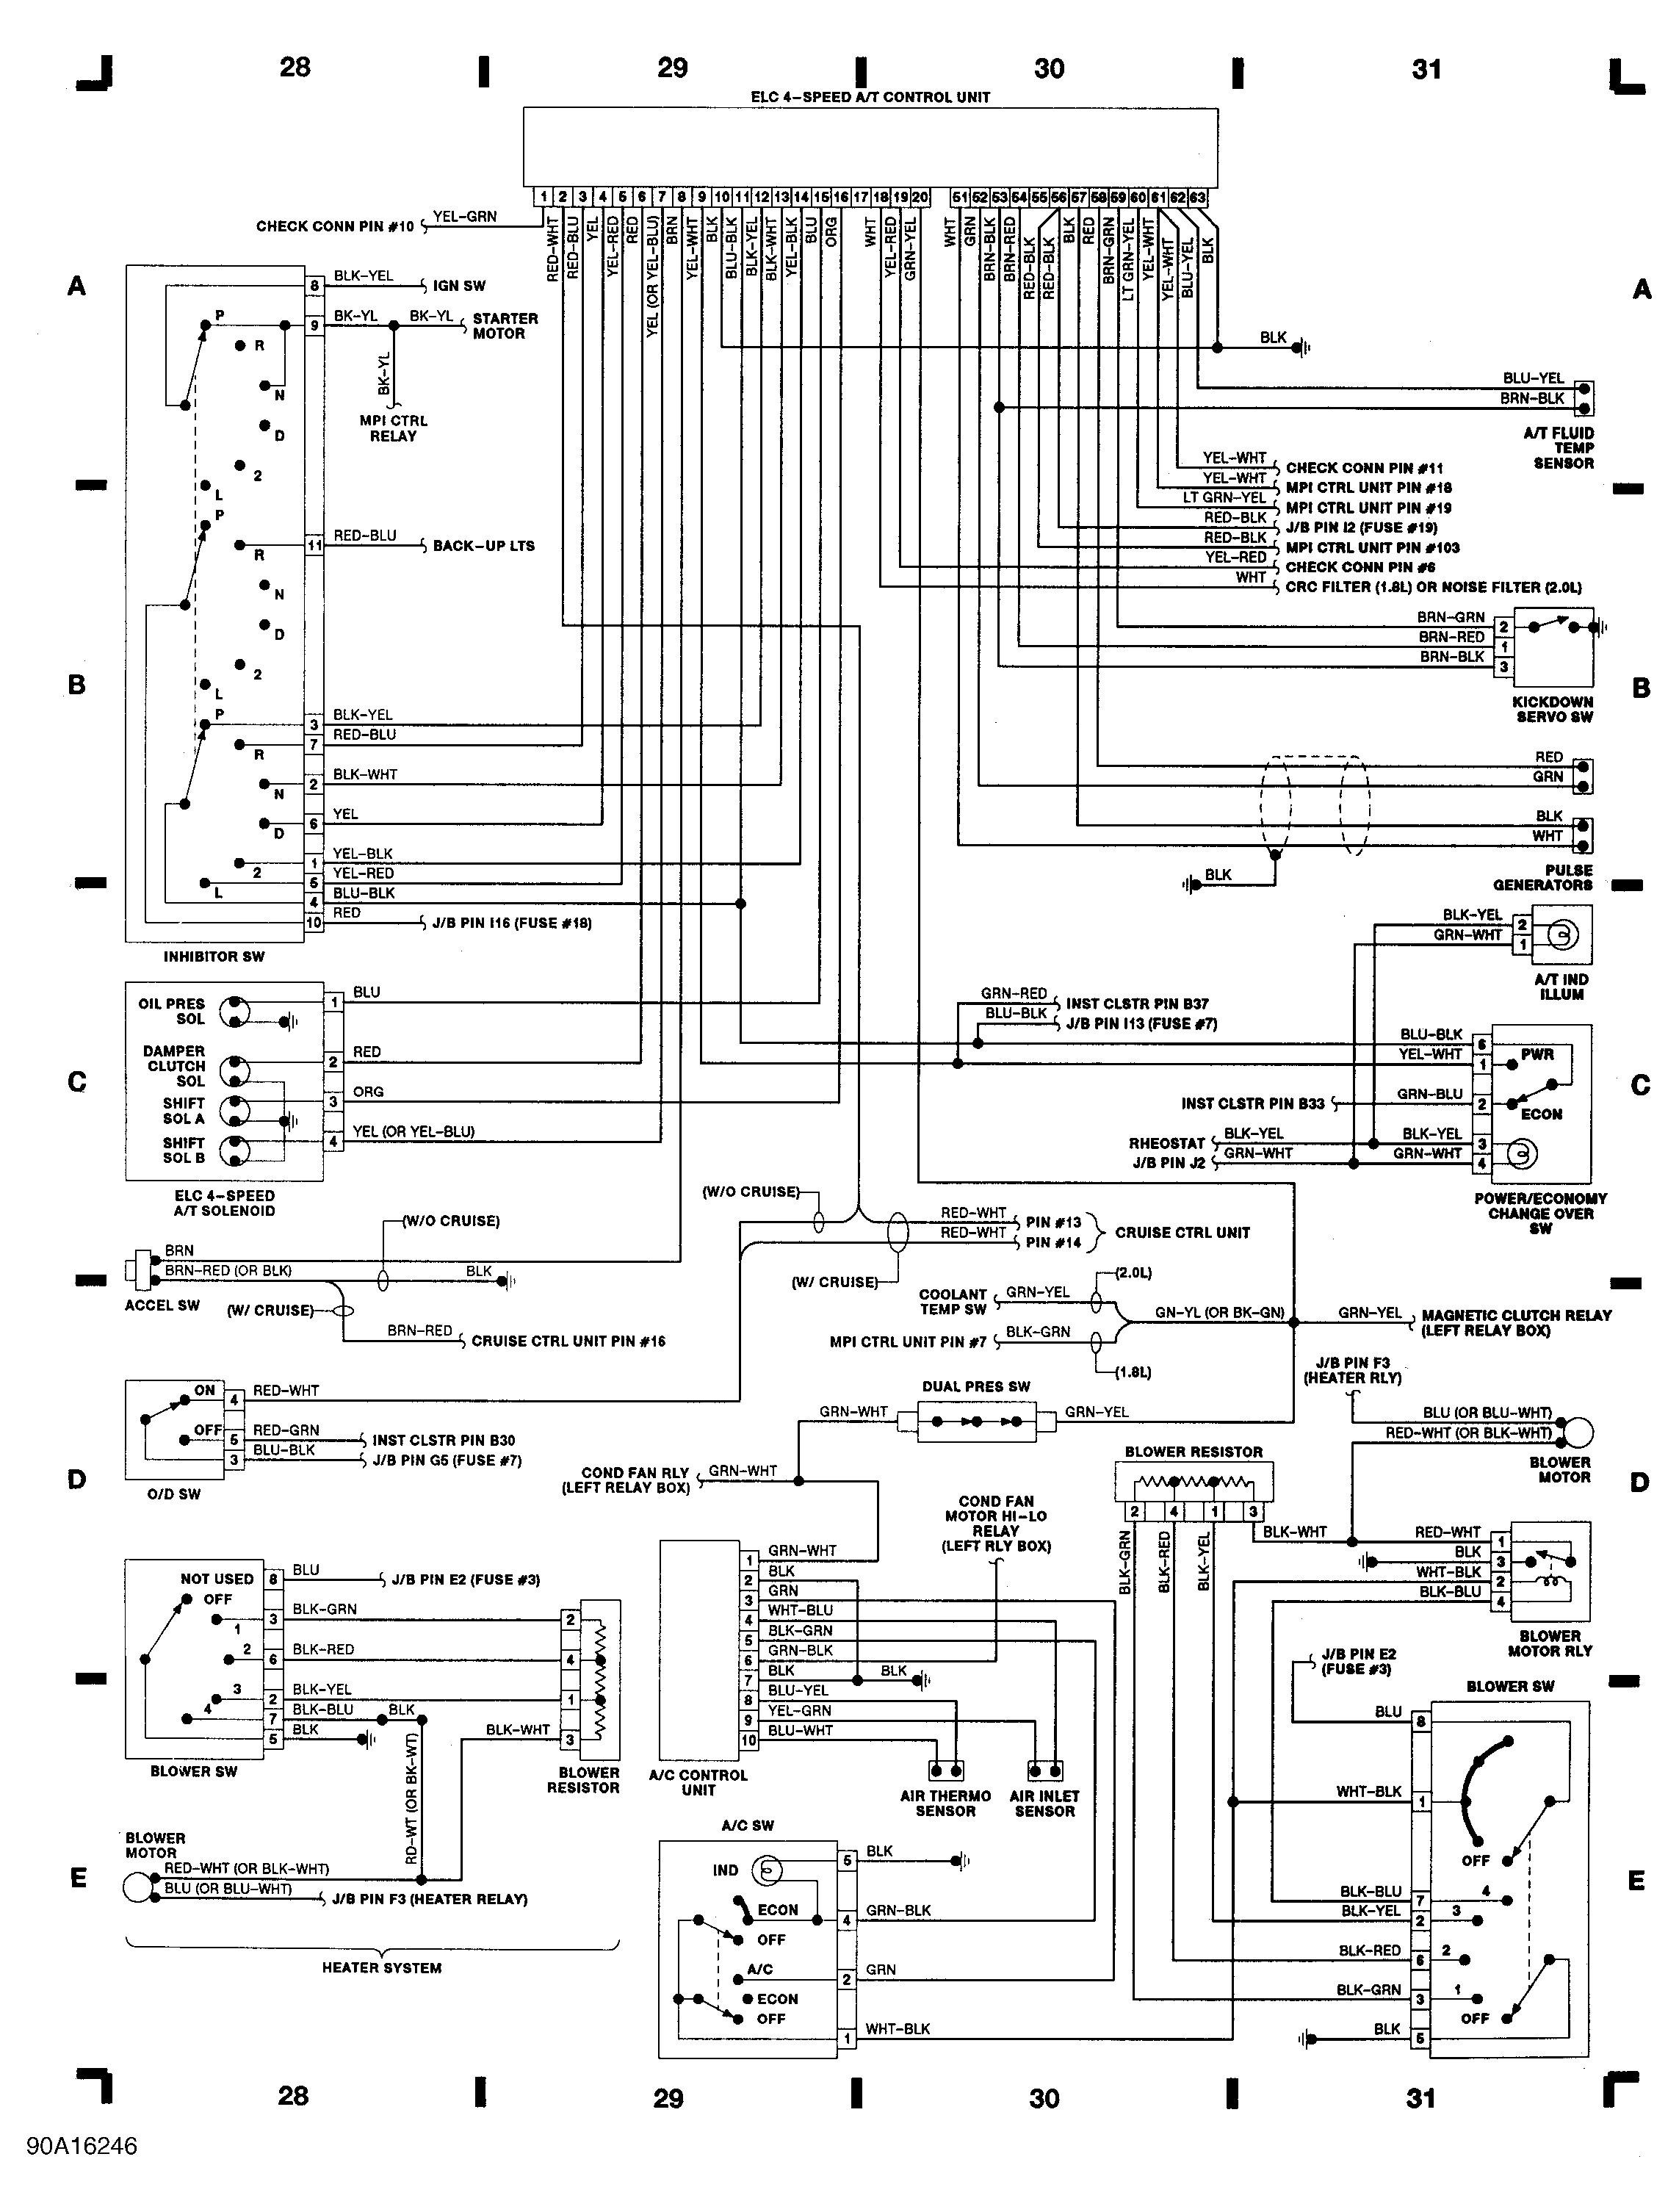 Transmission Diagram Manual Automatic Transmission Wiring Diagram New Automatic Dsm S Of Transmission Diagram Manual